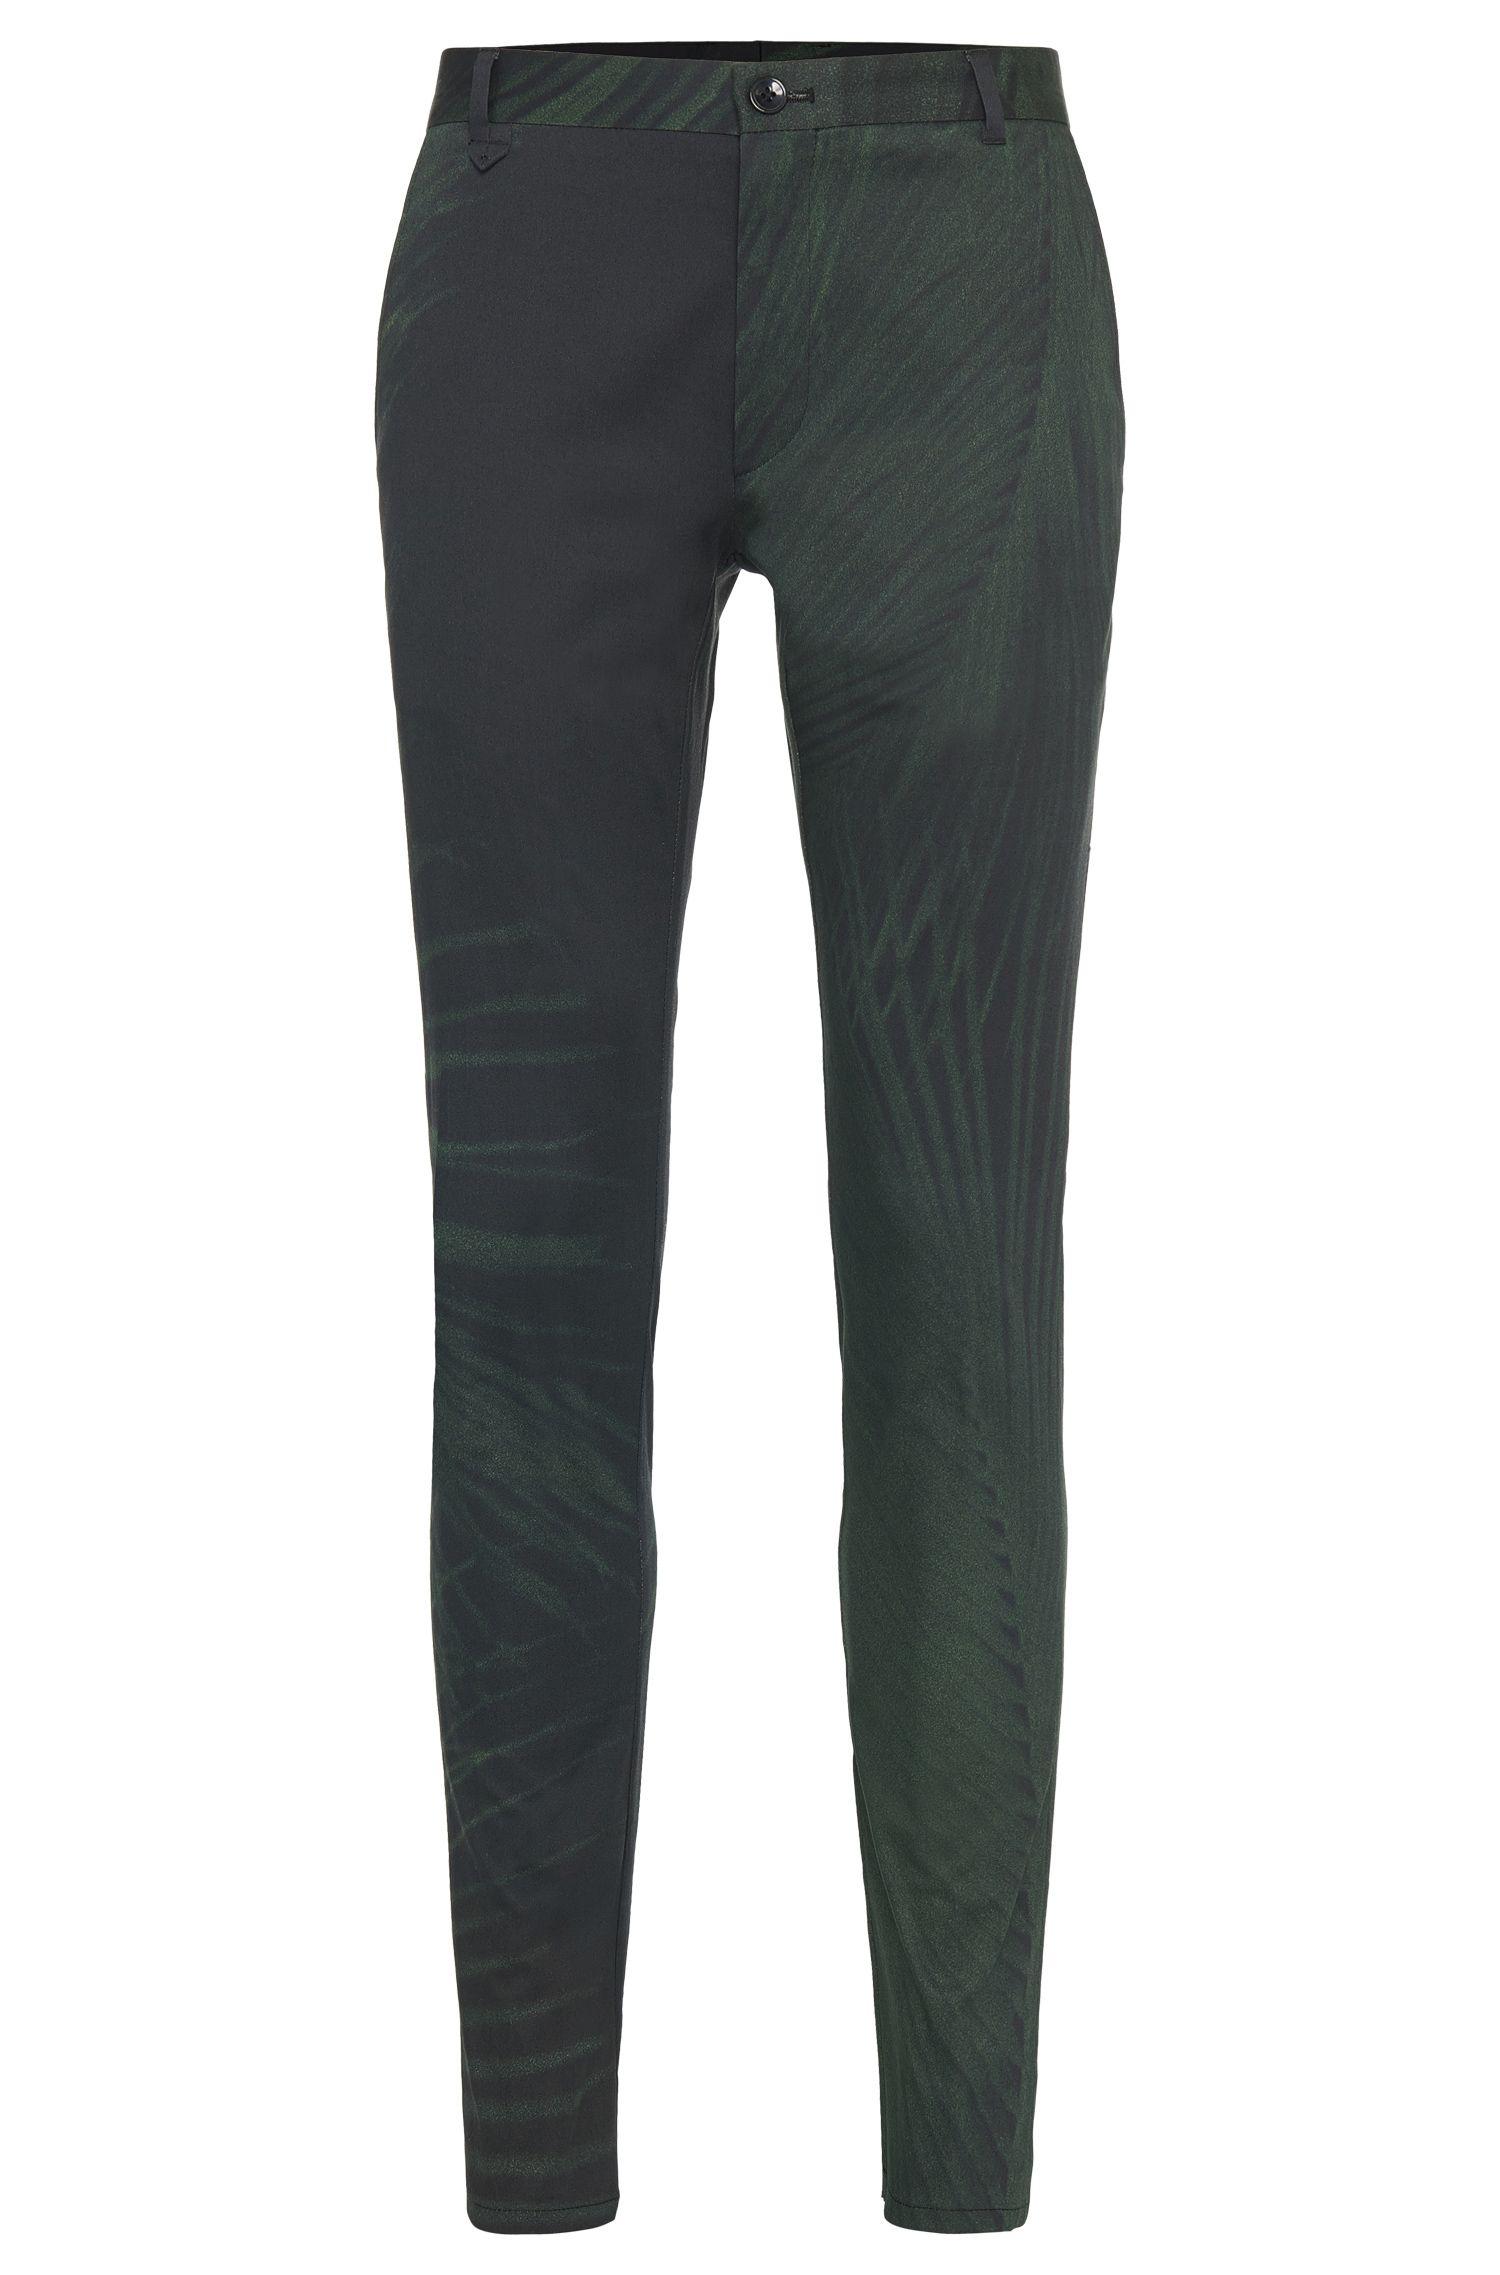 'Heldor-Print' | Extra Slim Fit, Stretch Cotton Dress Pants